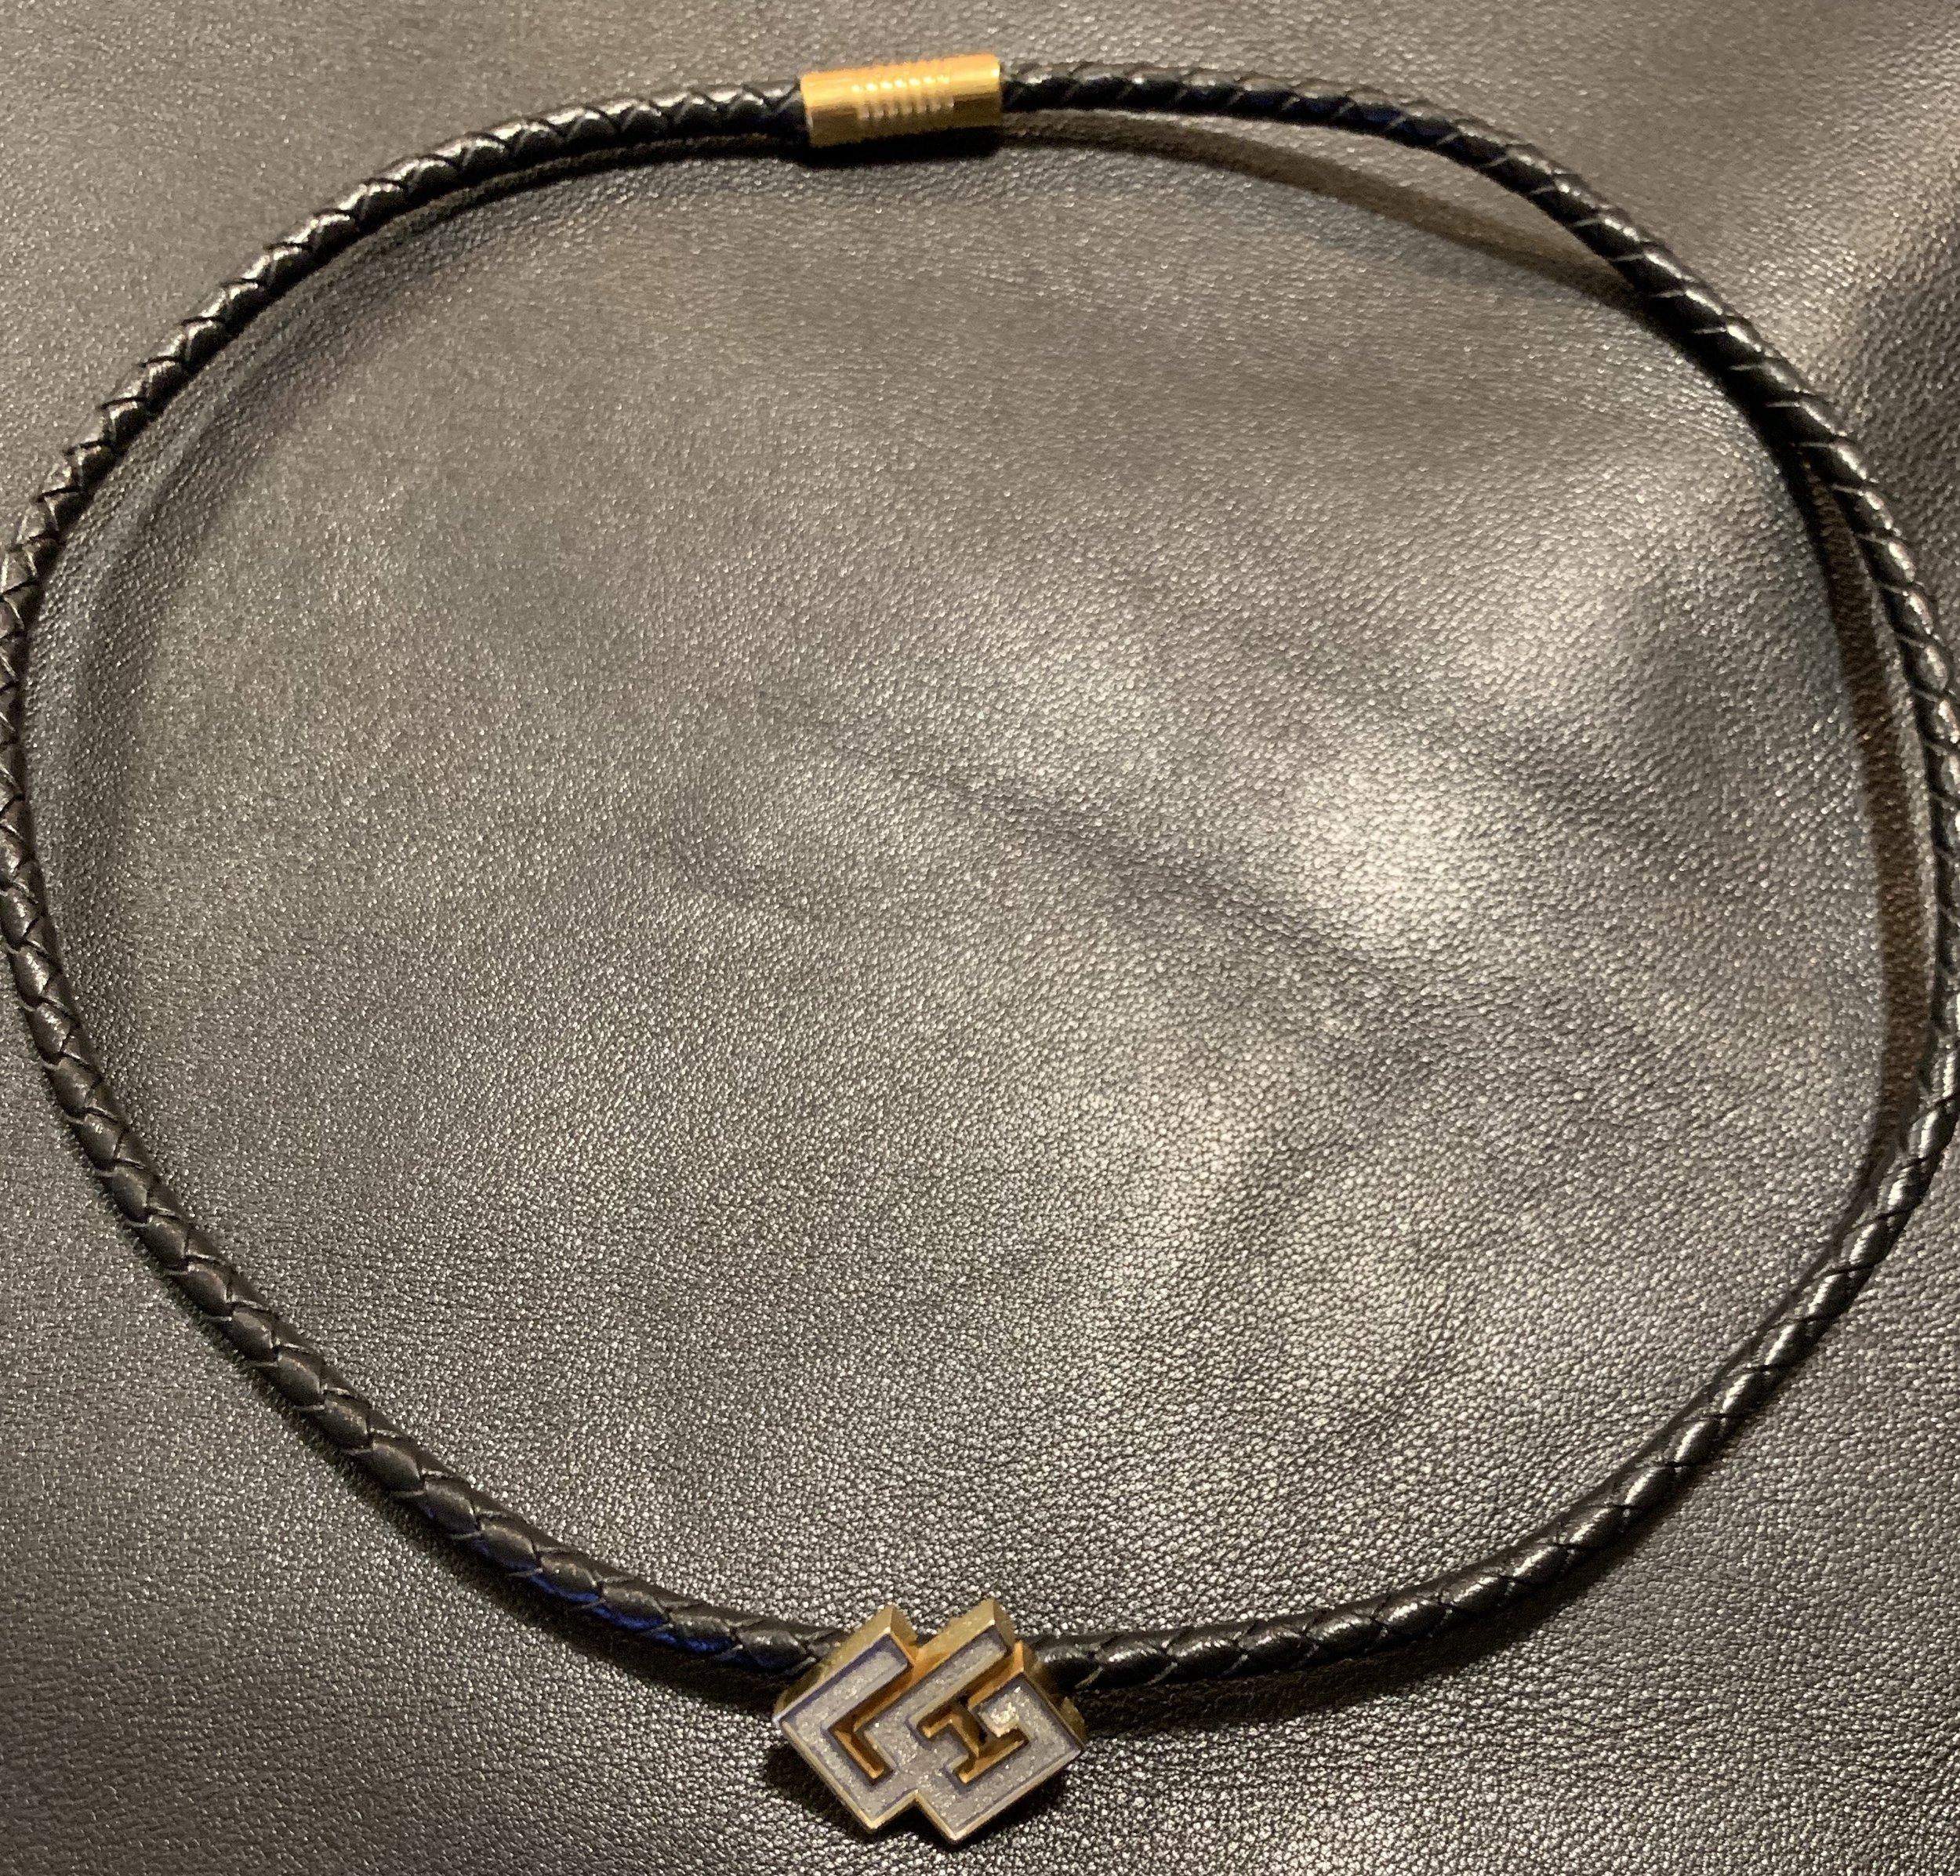 CG Necklace/bracelet 199.00